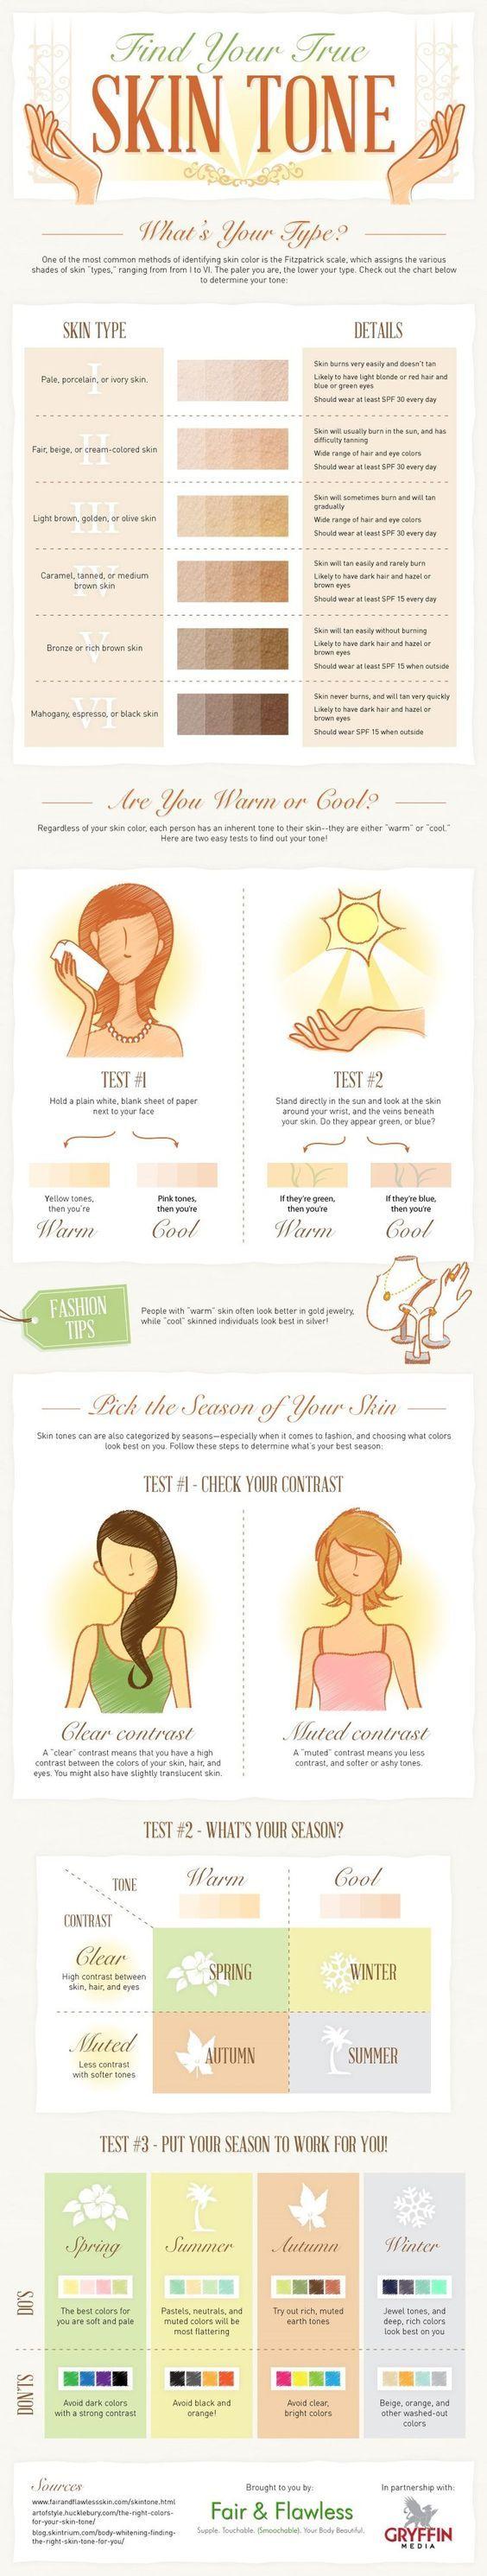 how to get perfect skin tones in lightroom 5